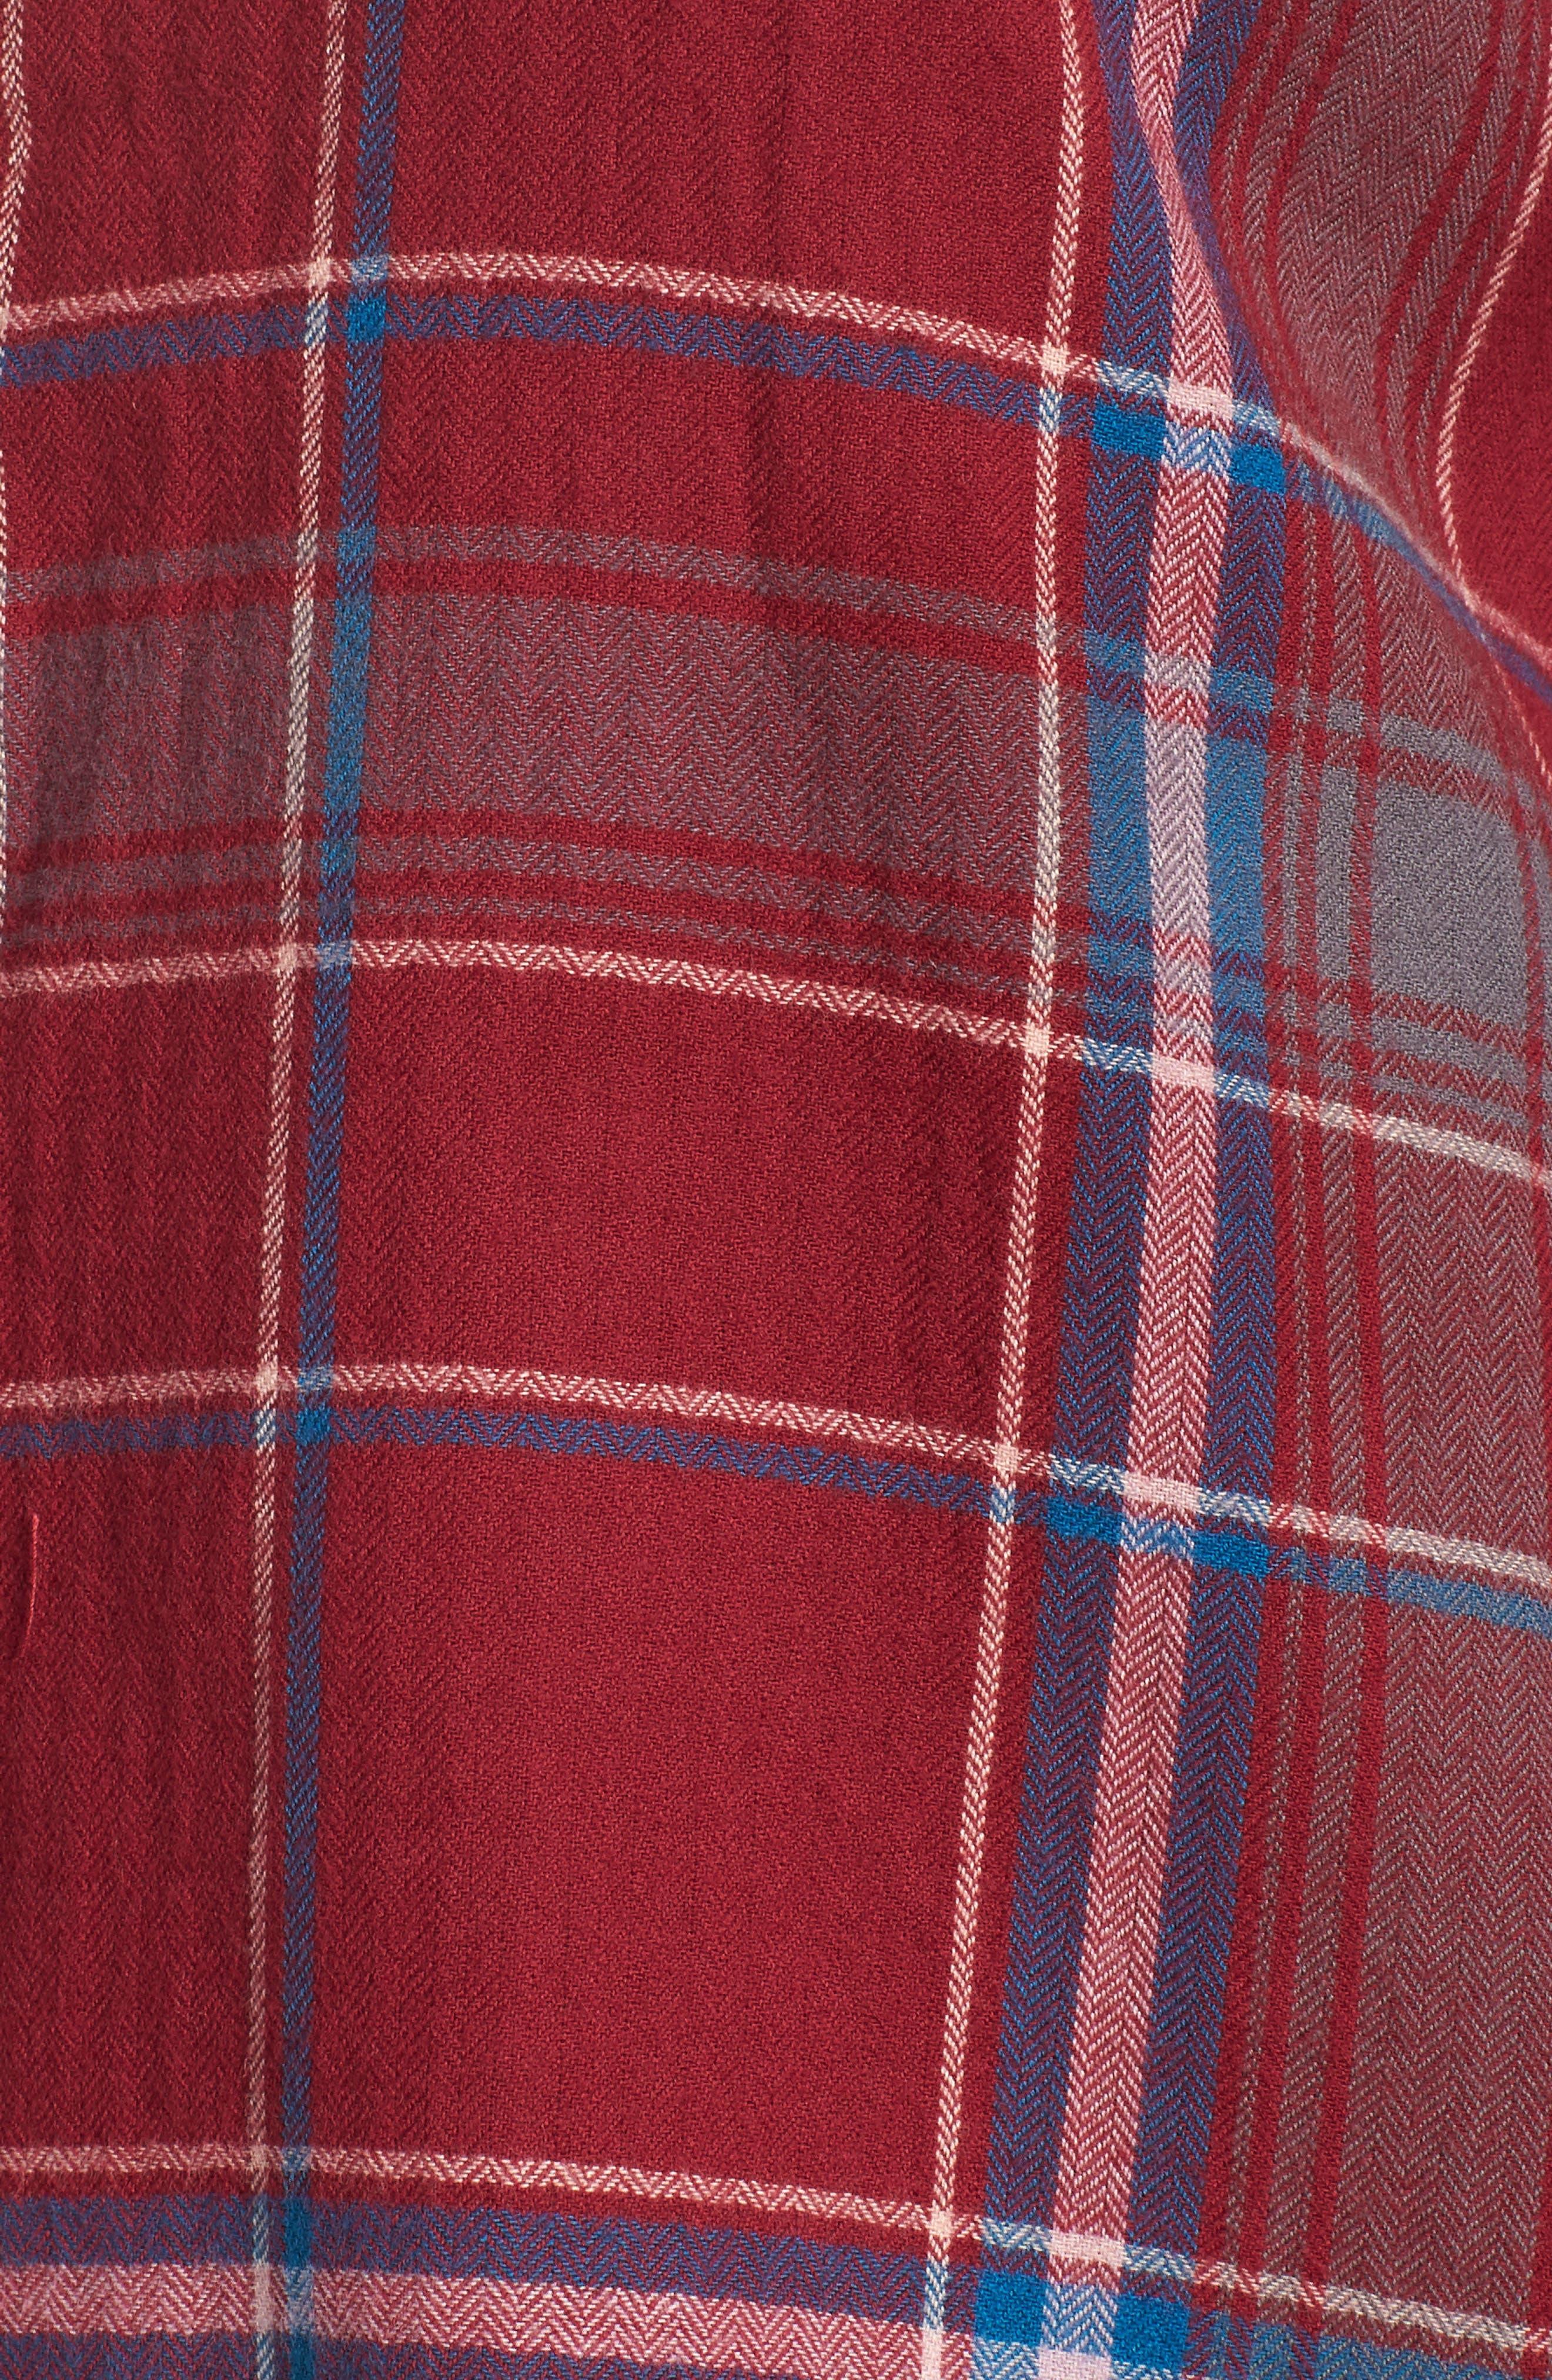 Frayed Edge Plaid Shirt,                             Alternate thumbnail 12, color,                             RED RUMBA NICOLE PLAID